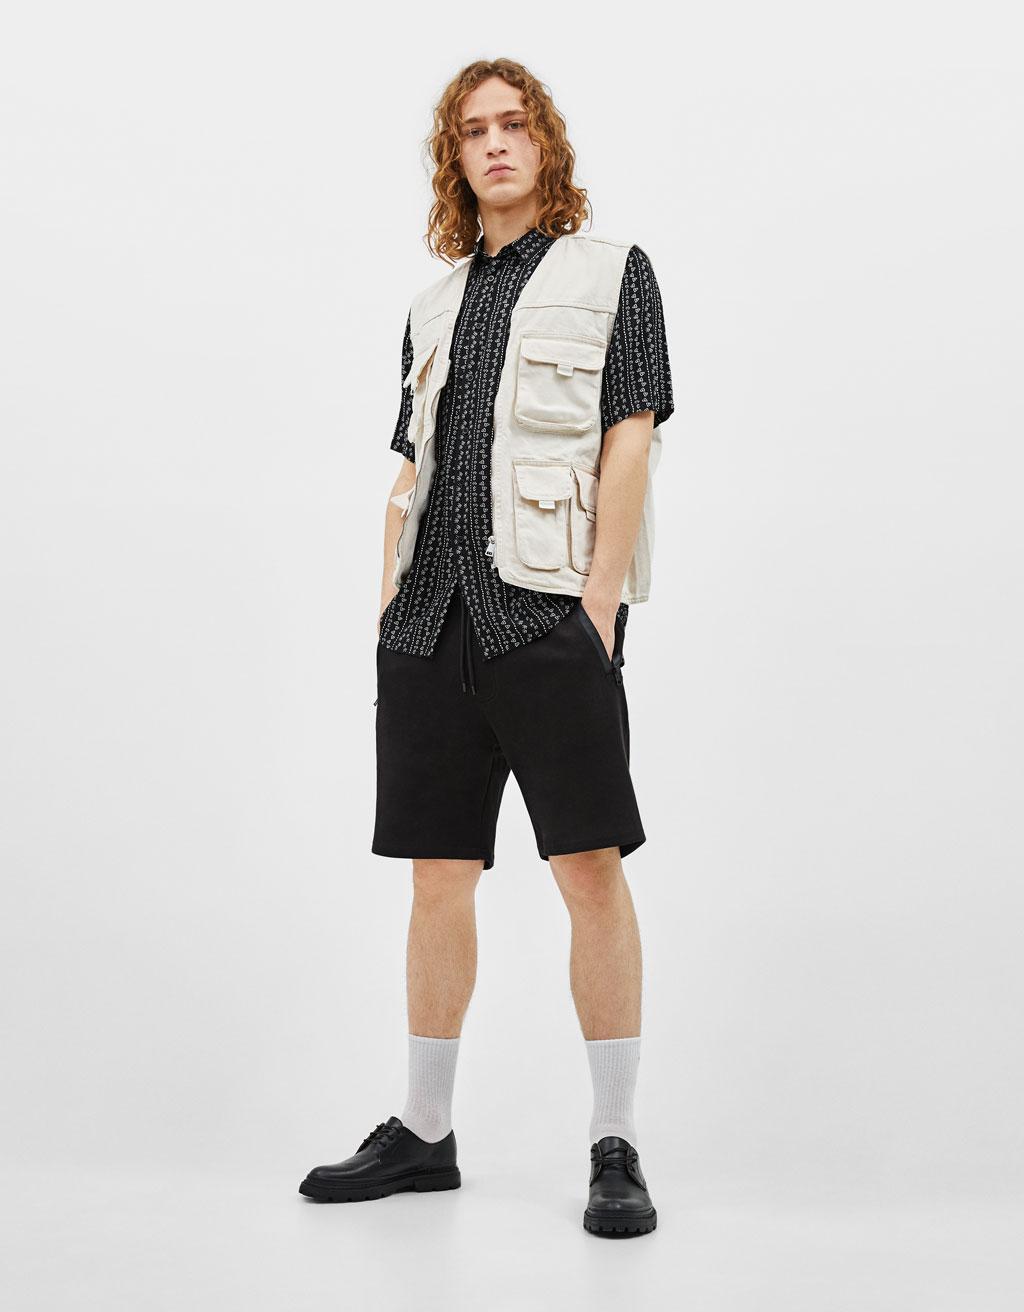 Bermuda shorts with zip pockets